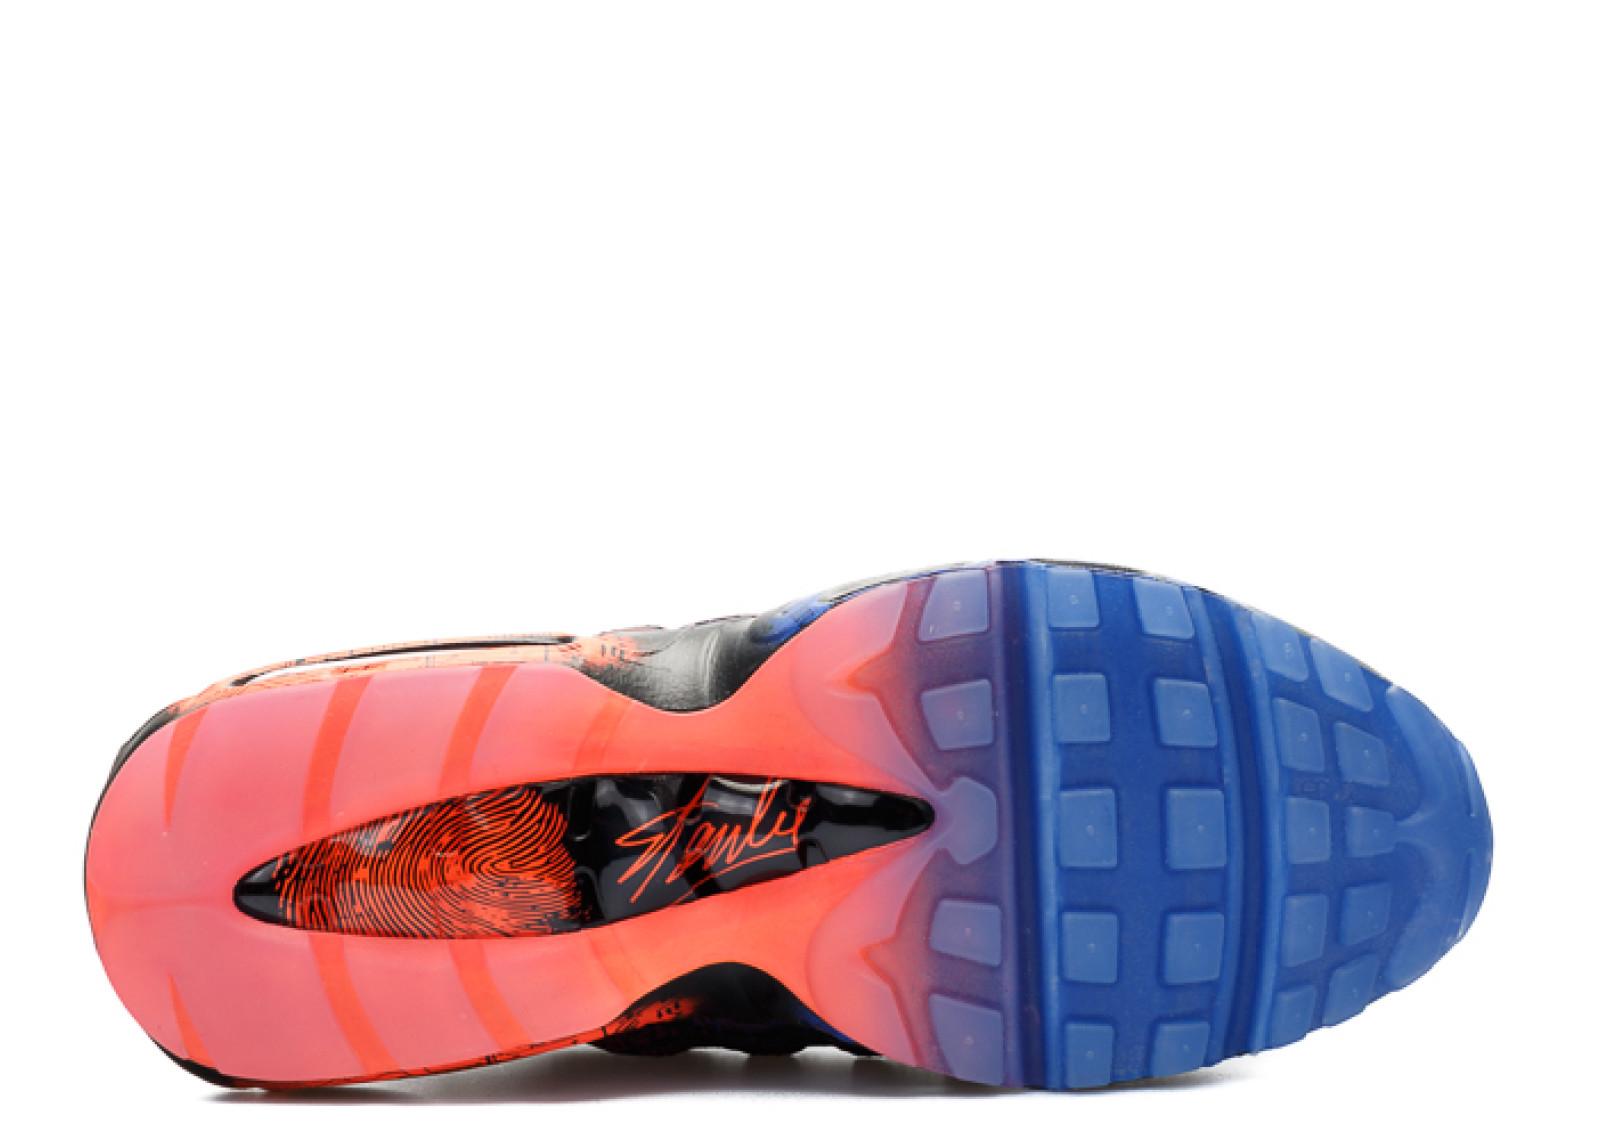 6c4c6c40a6 IMG_0049.jpeg. Rishi Savera · Shoes · Air Max 95, Nike ...